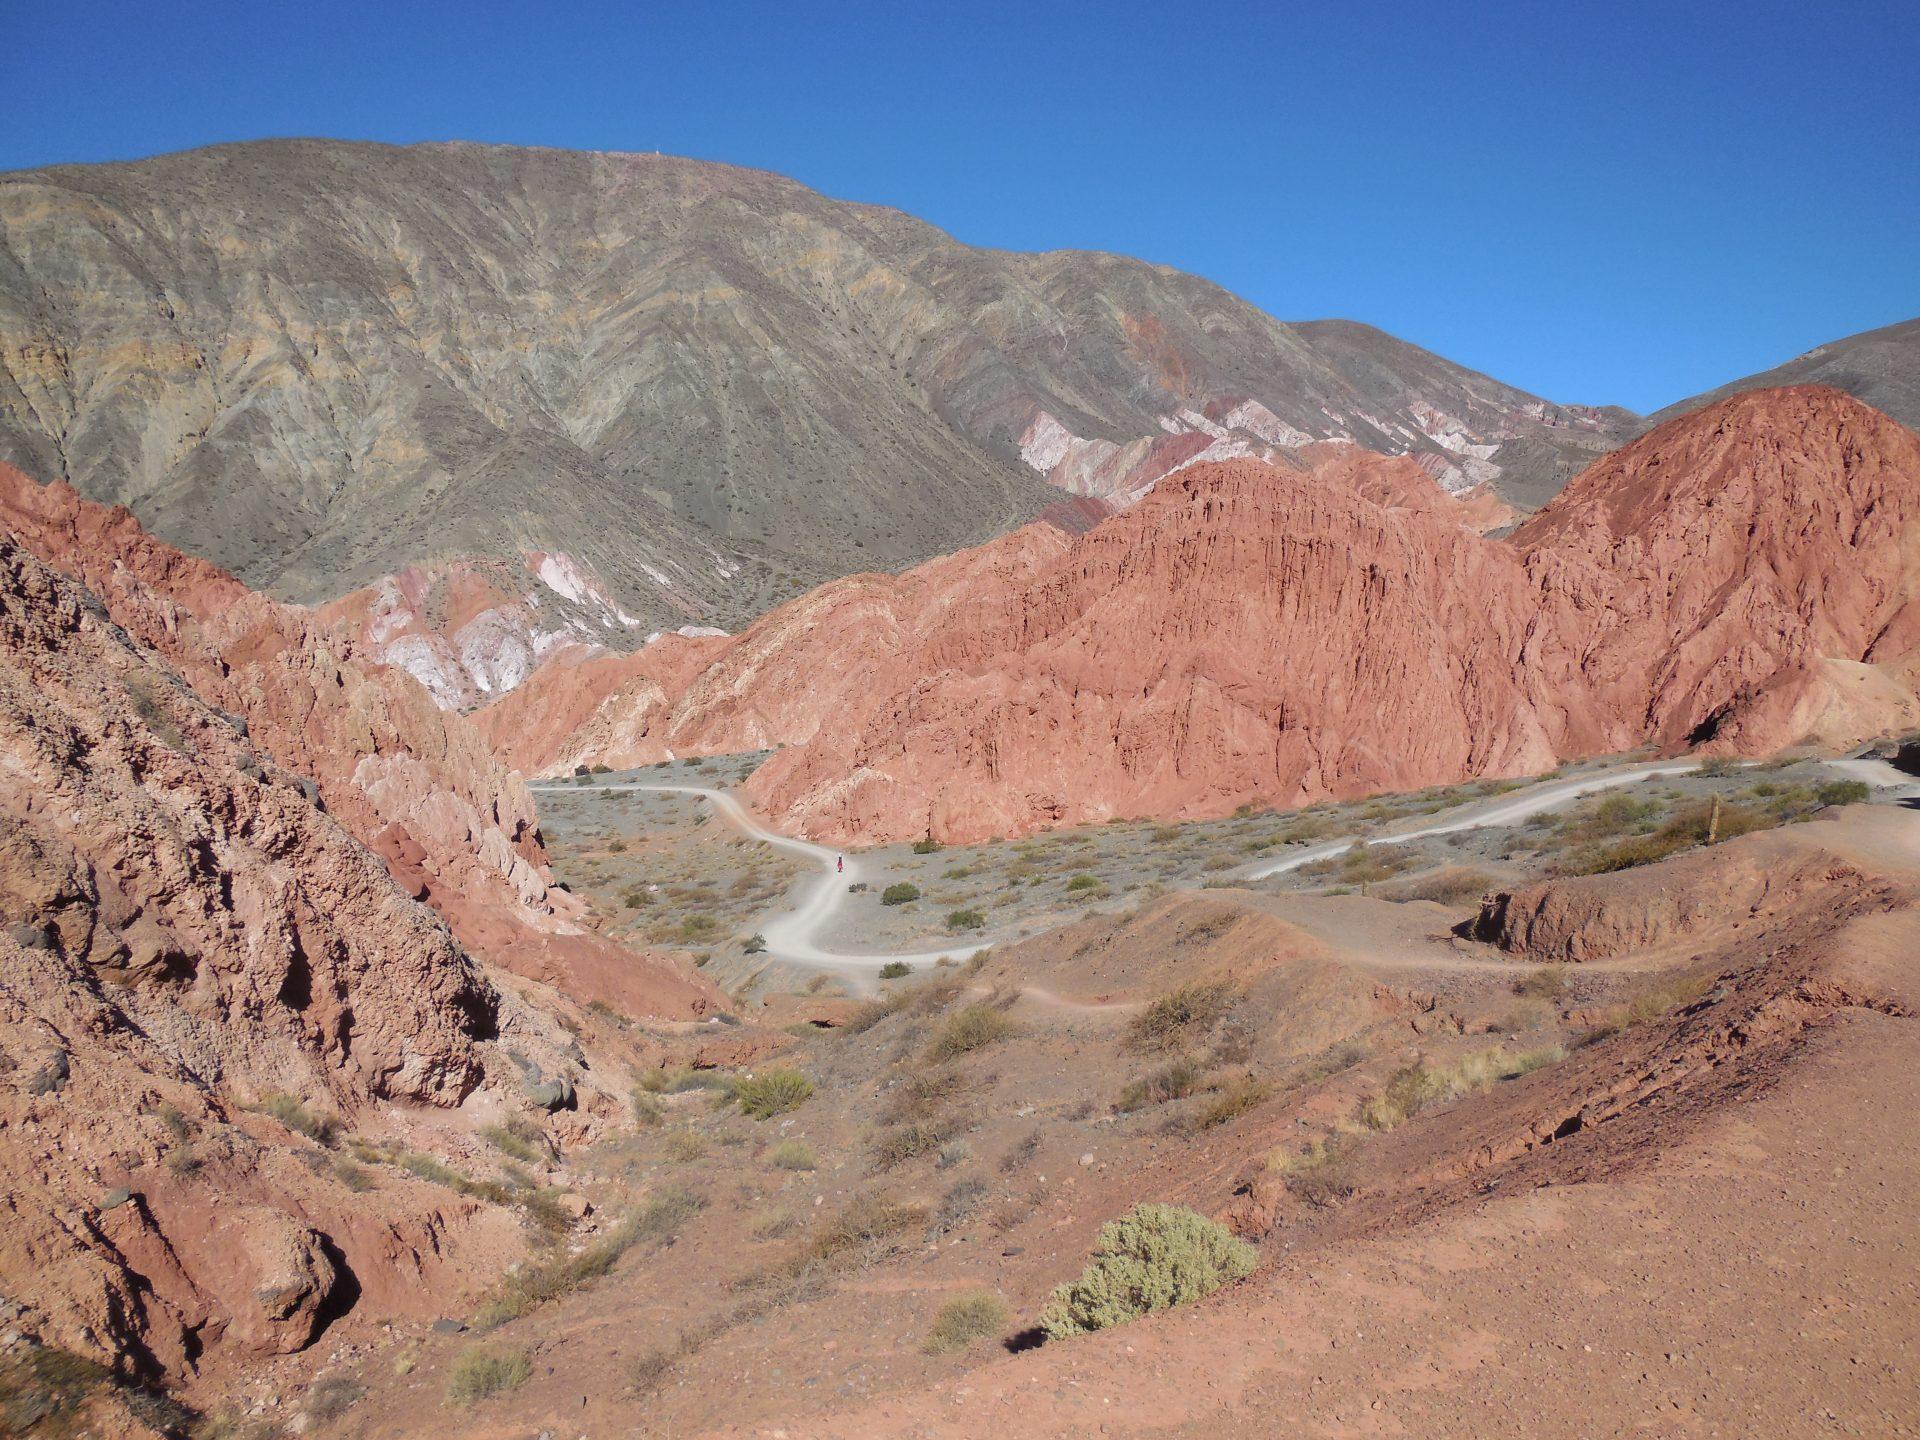 Argentinien Norden Salta Purmamarca Humahuaca Reise Erfahrung Bus Buenos Aires